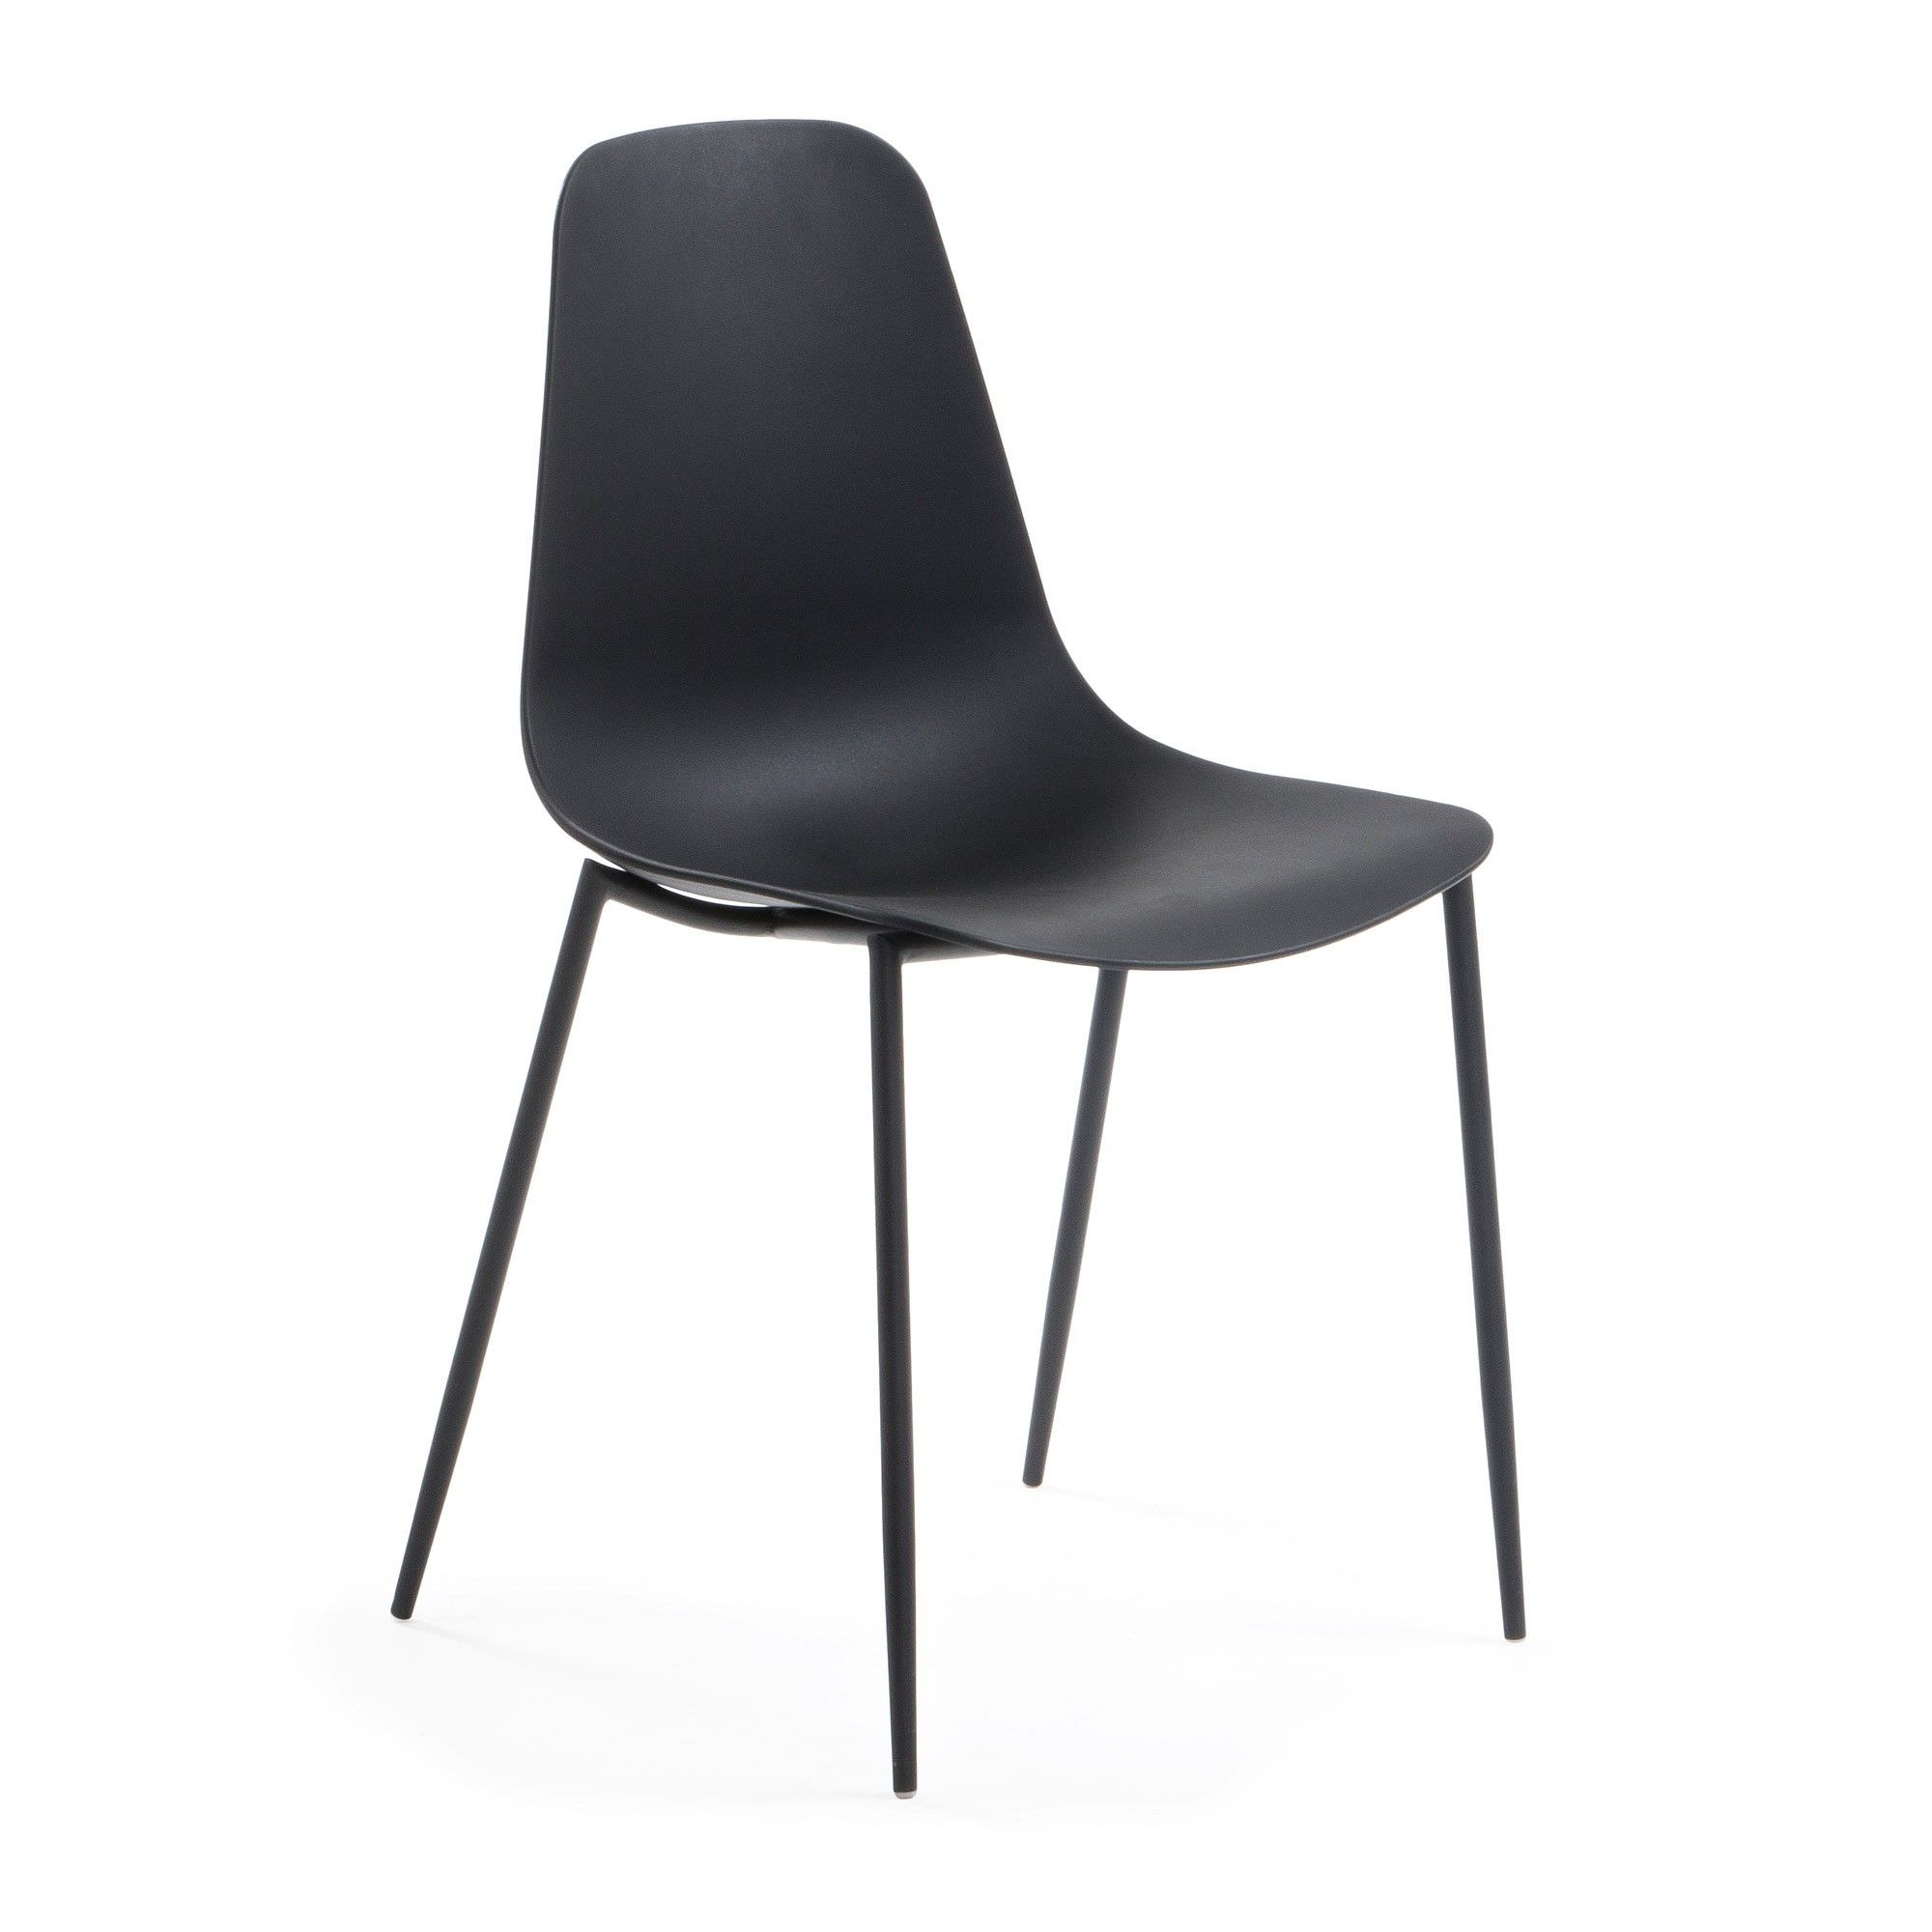 Wynifred Dining Chair, Black